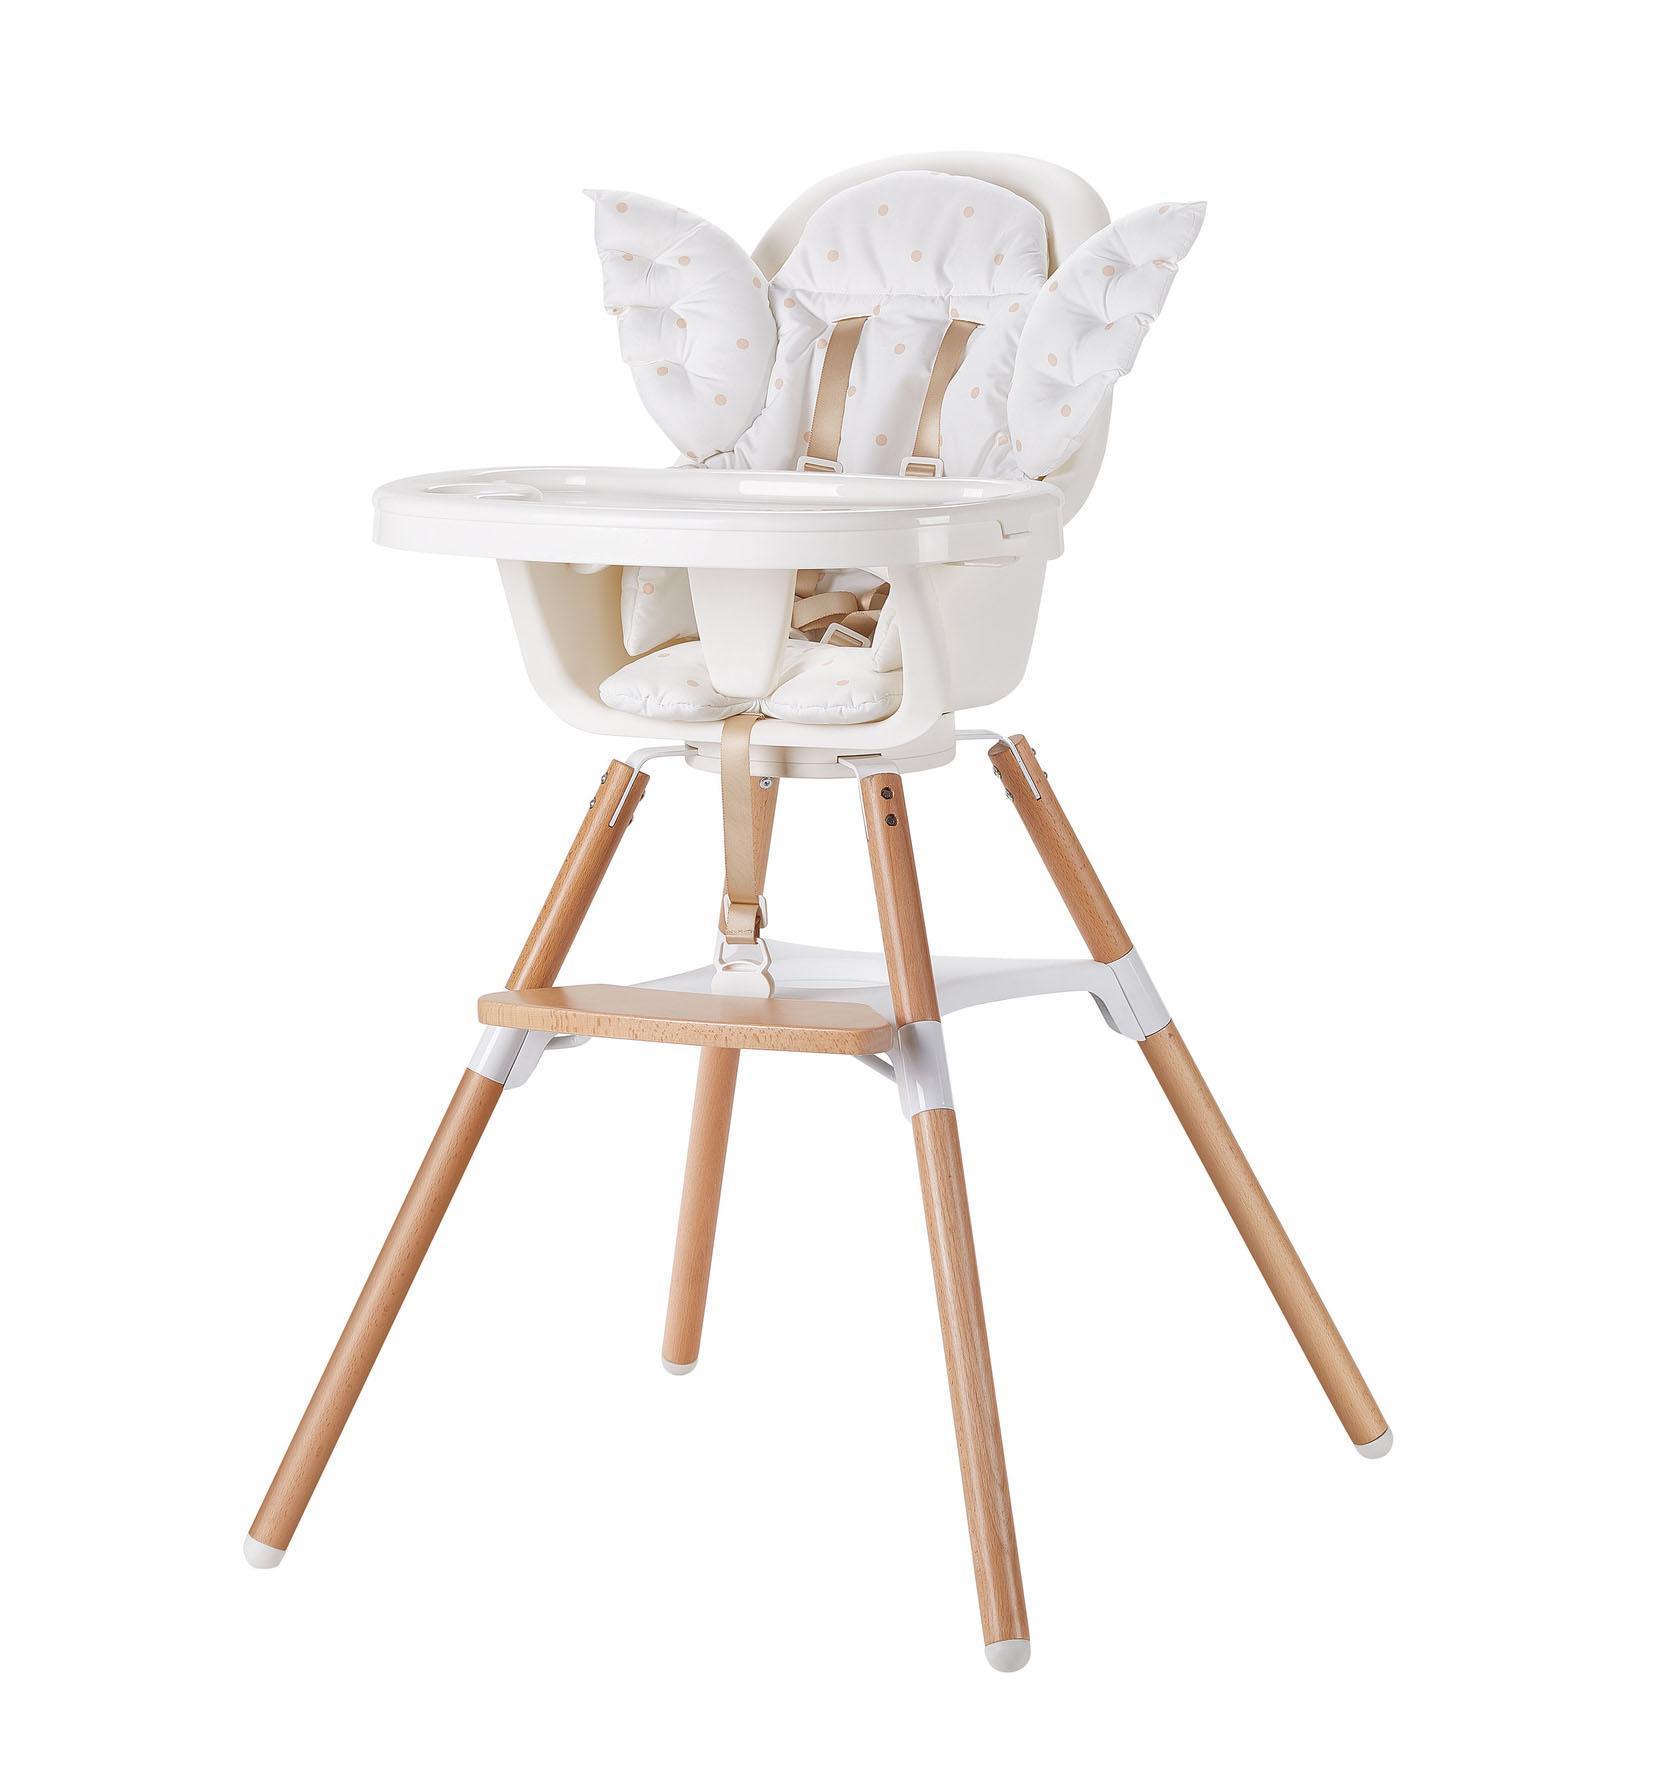 Harari Baby counter high chairs baby Supply-2